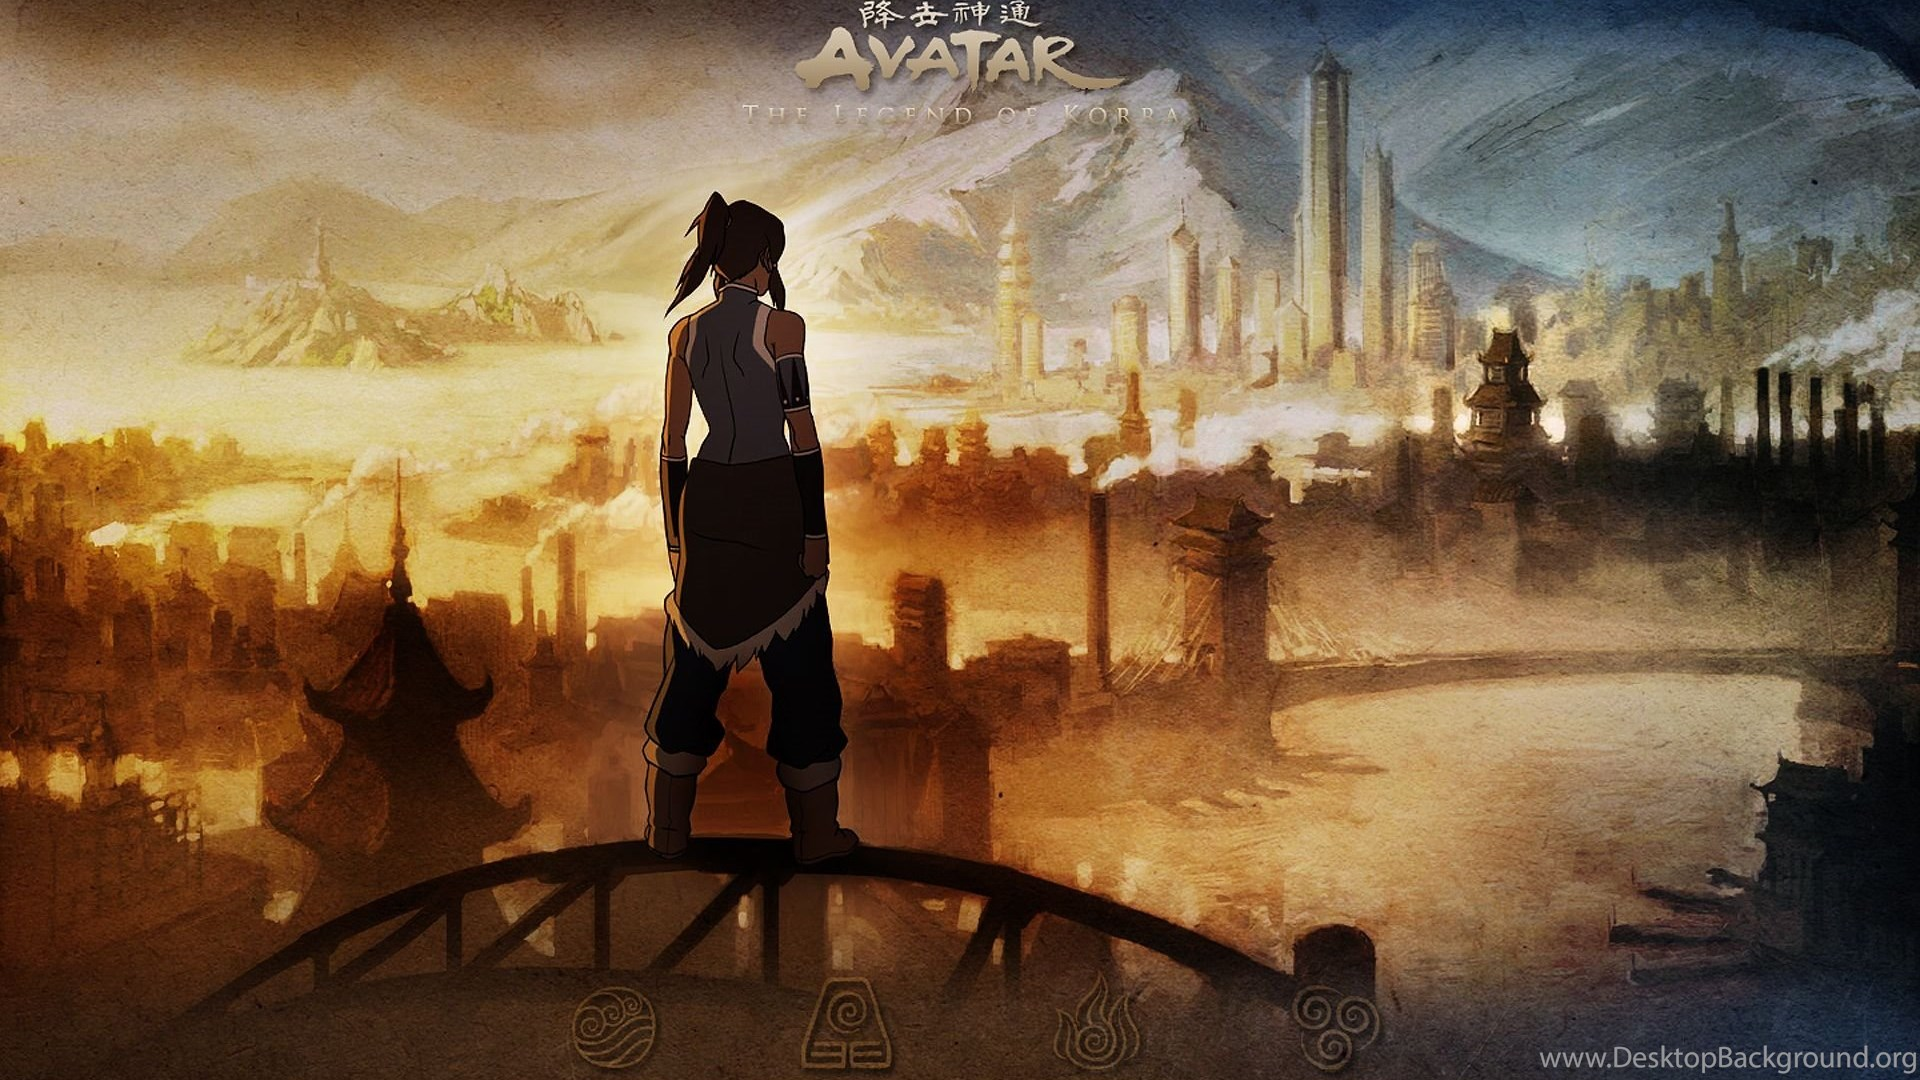 Legend Of Korra Avatar The Last Airbender Wallpapers 15680801